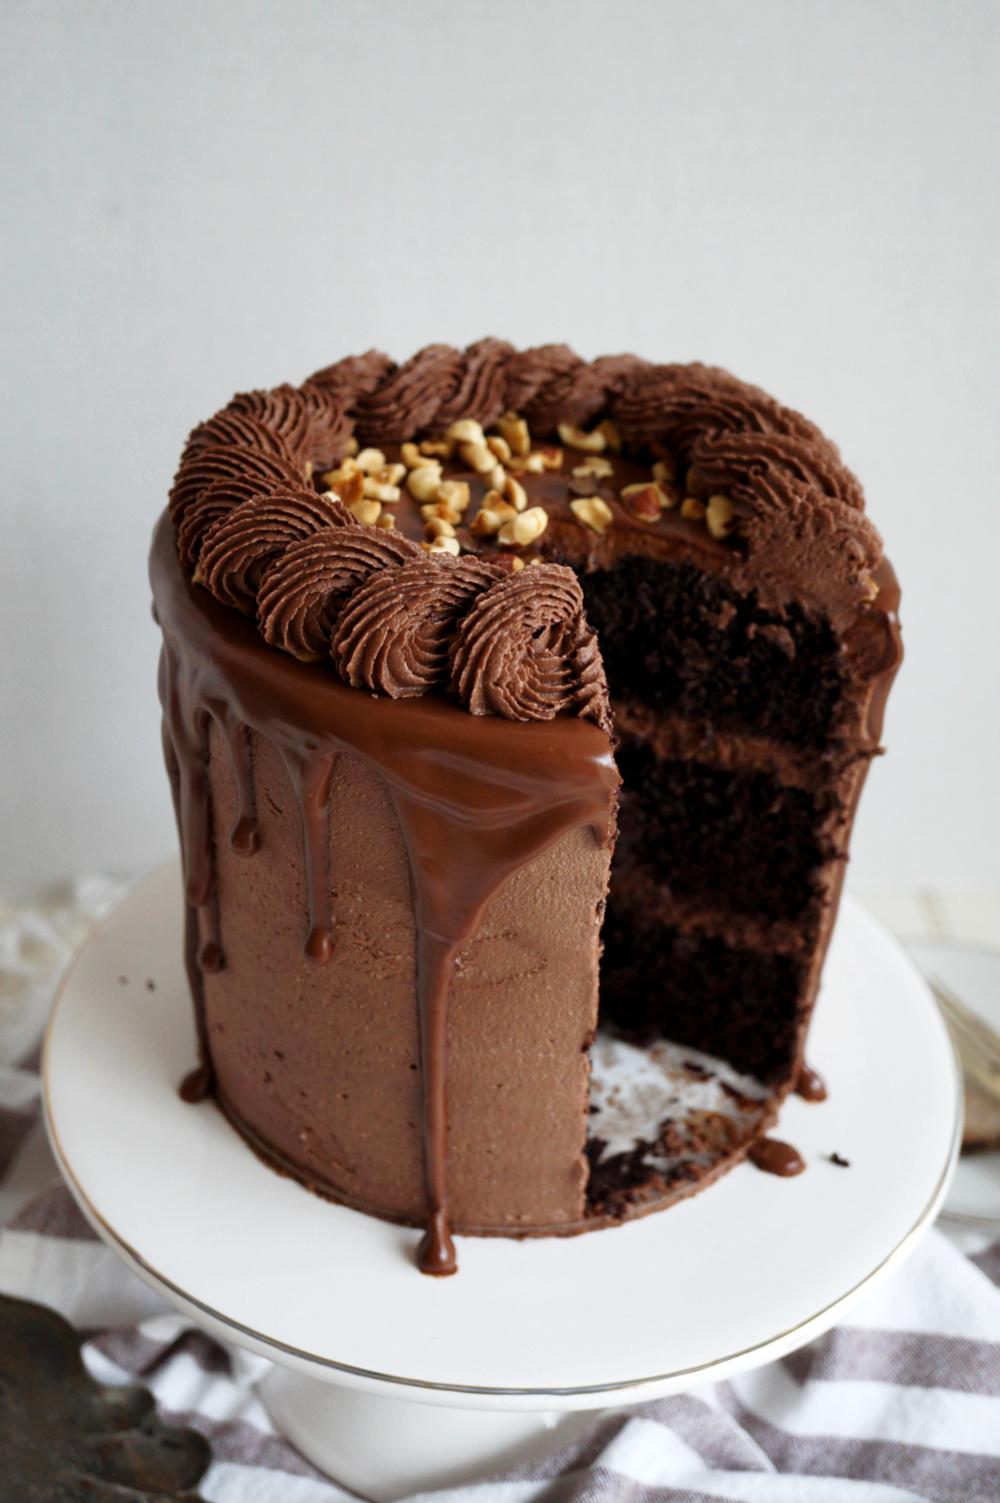 chocolate hazelnut cake with slice cut out